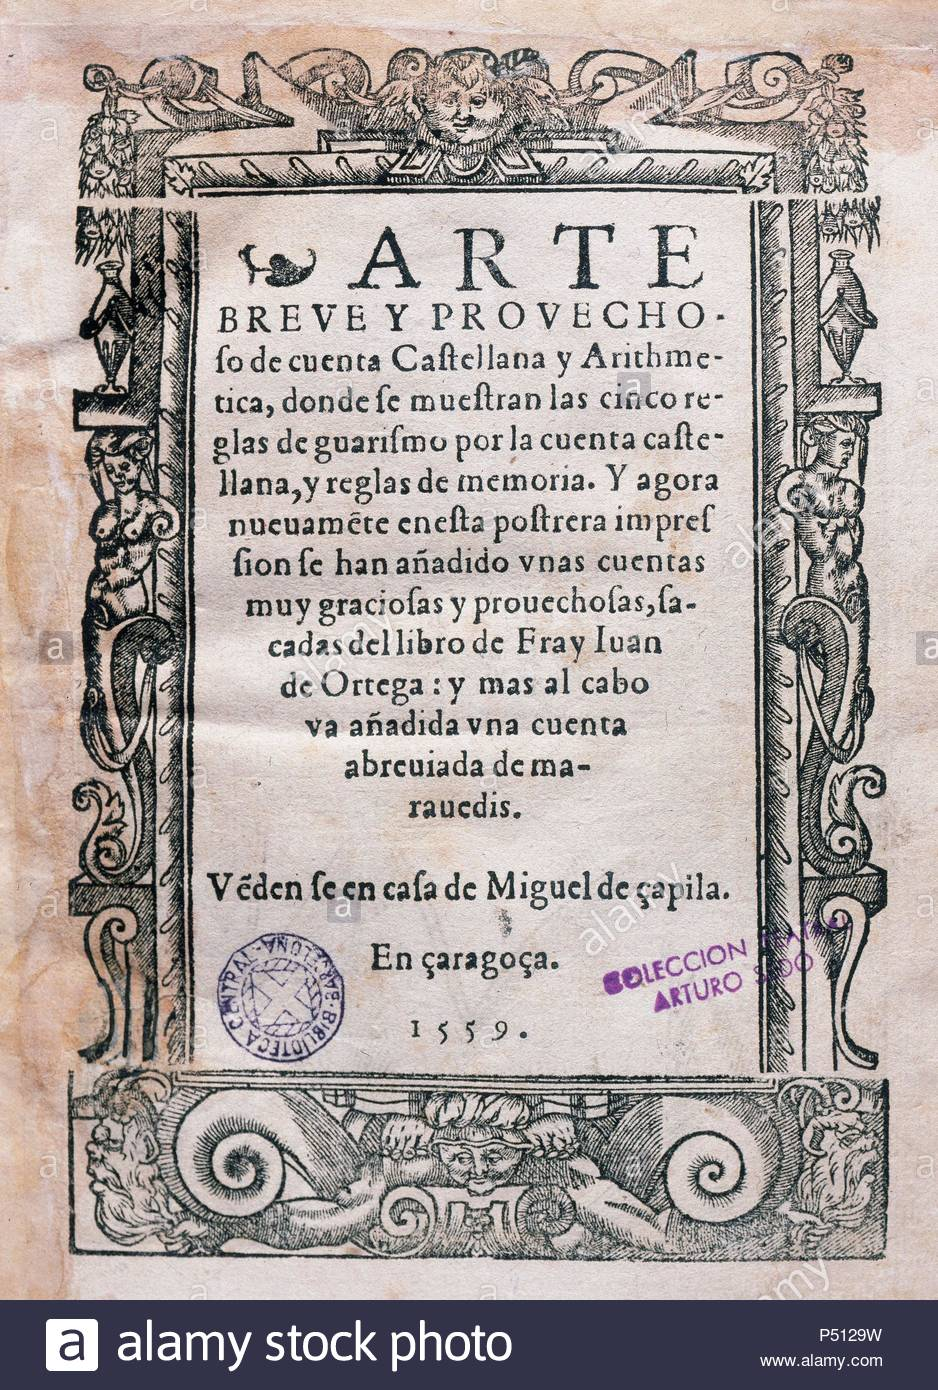 Juan de Ortega (1480-1568). Spanish religious and mathematician. Arte Breve y Provechosa de Cuenta Castellana y Aritmetica. Title page. 1559. Zaragoza. Spain. - Stock Image